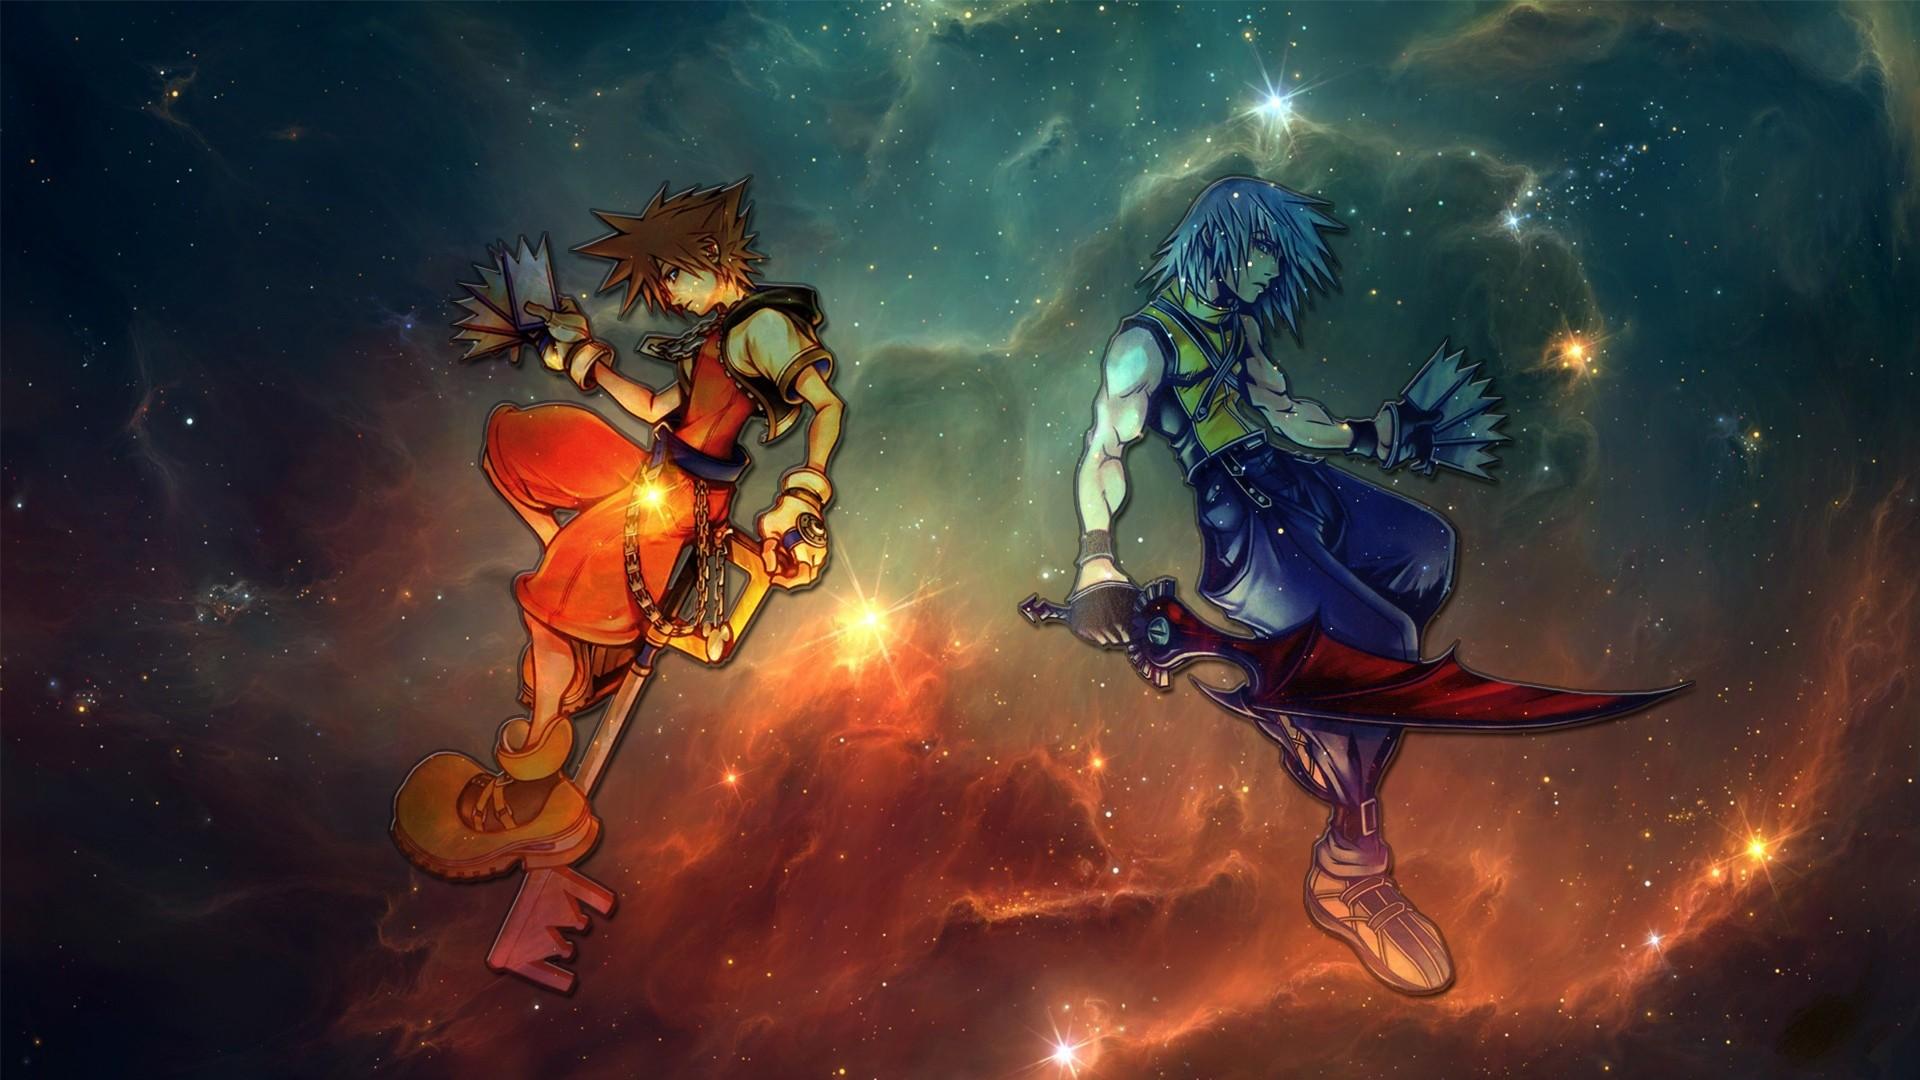 Kingdom Hearts 3 Background